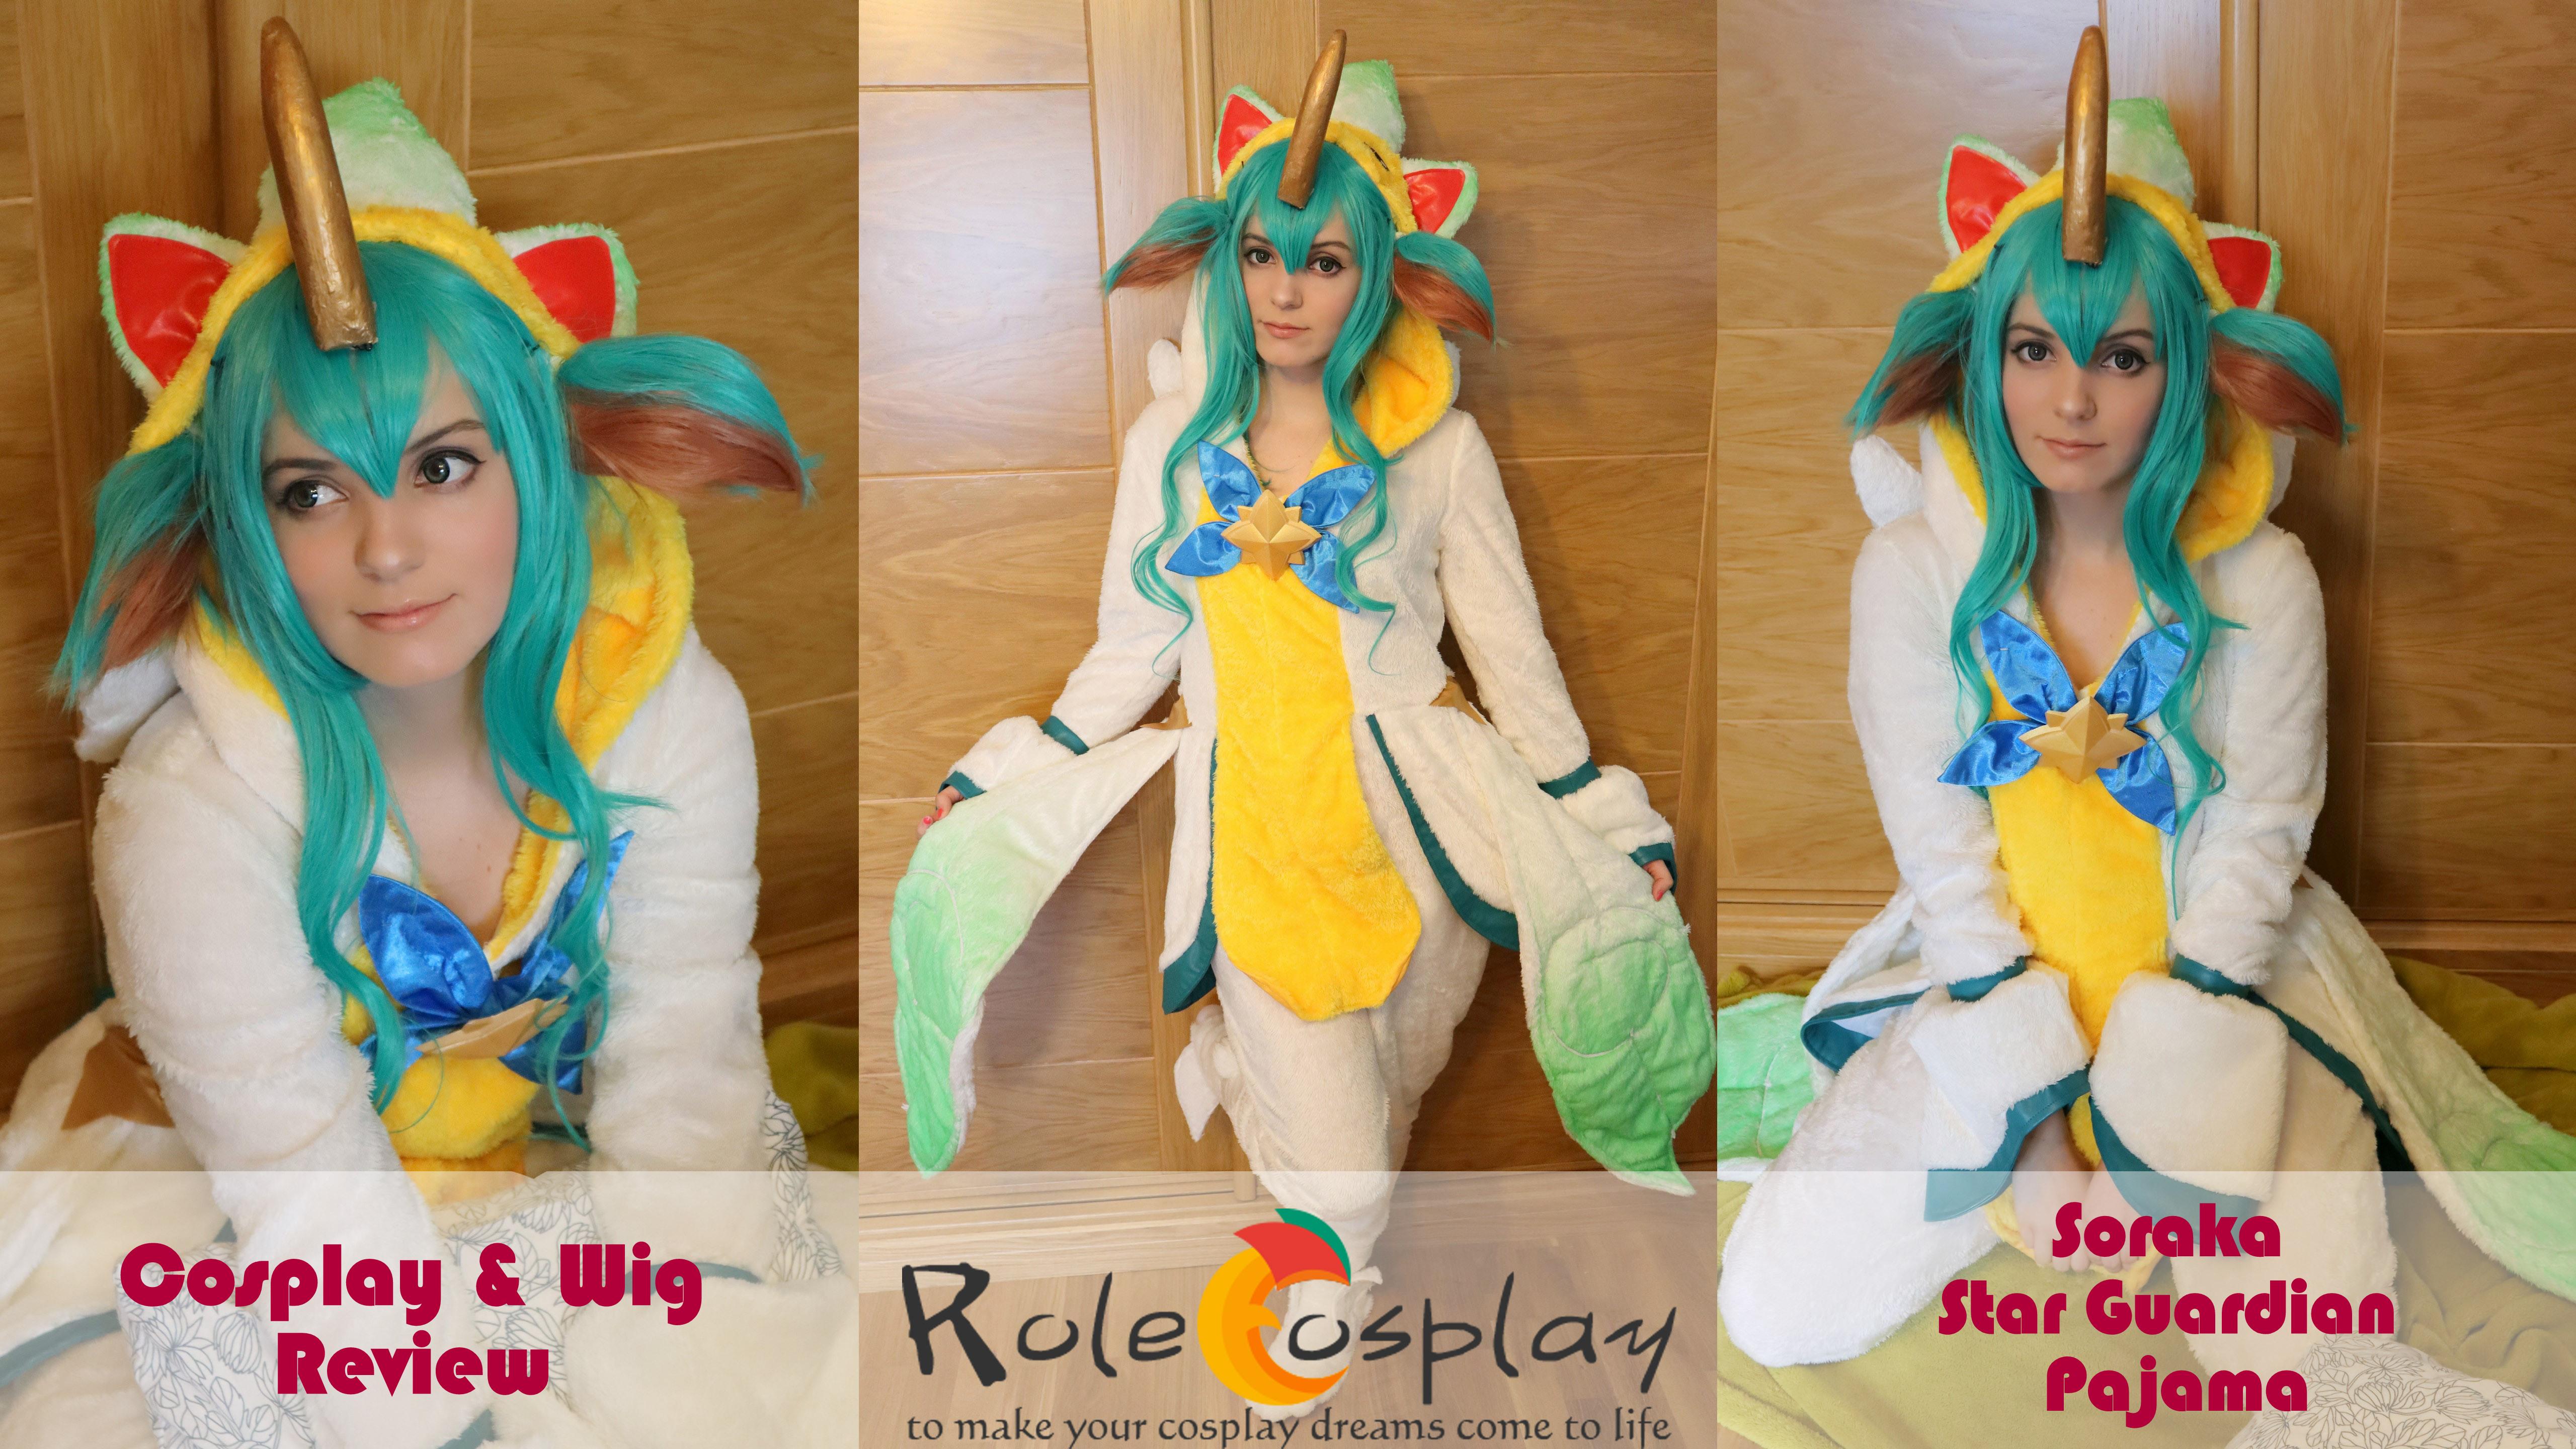 Cosplay & Wig Review: Soraka Star Guardian Pajama From